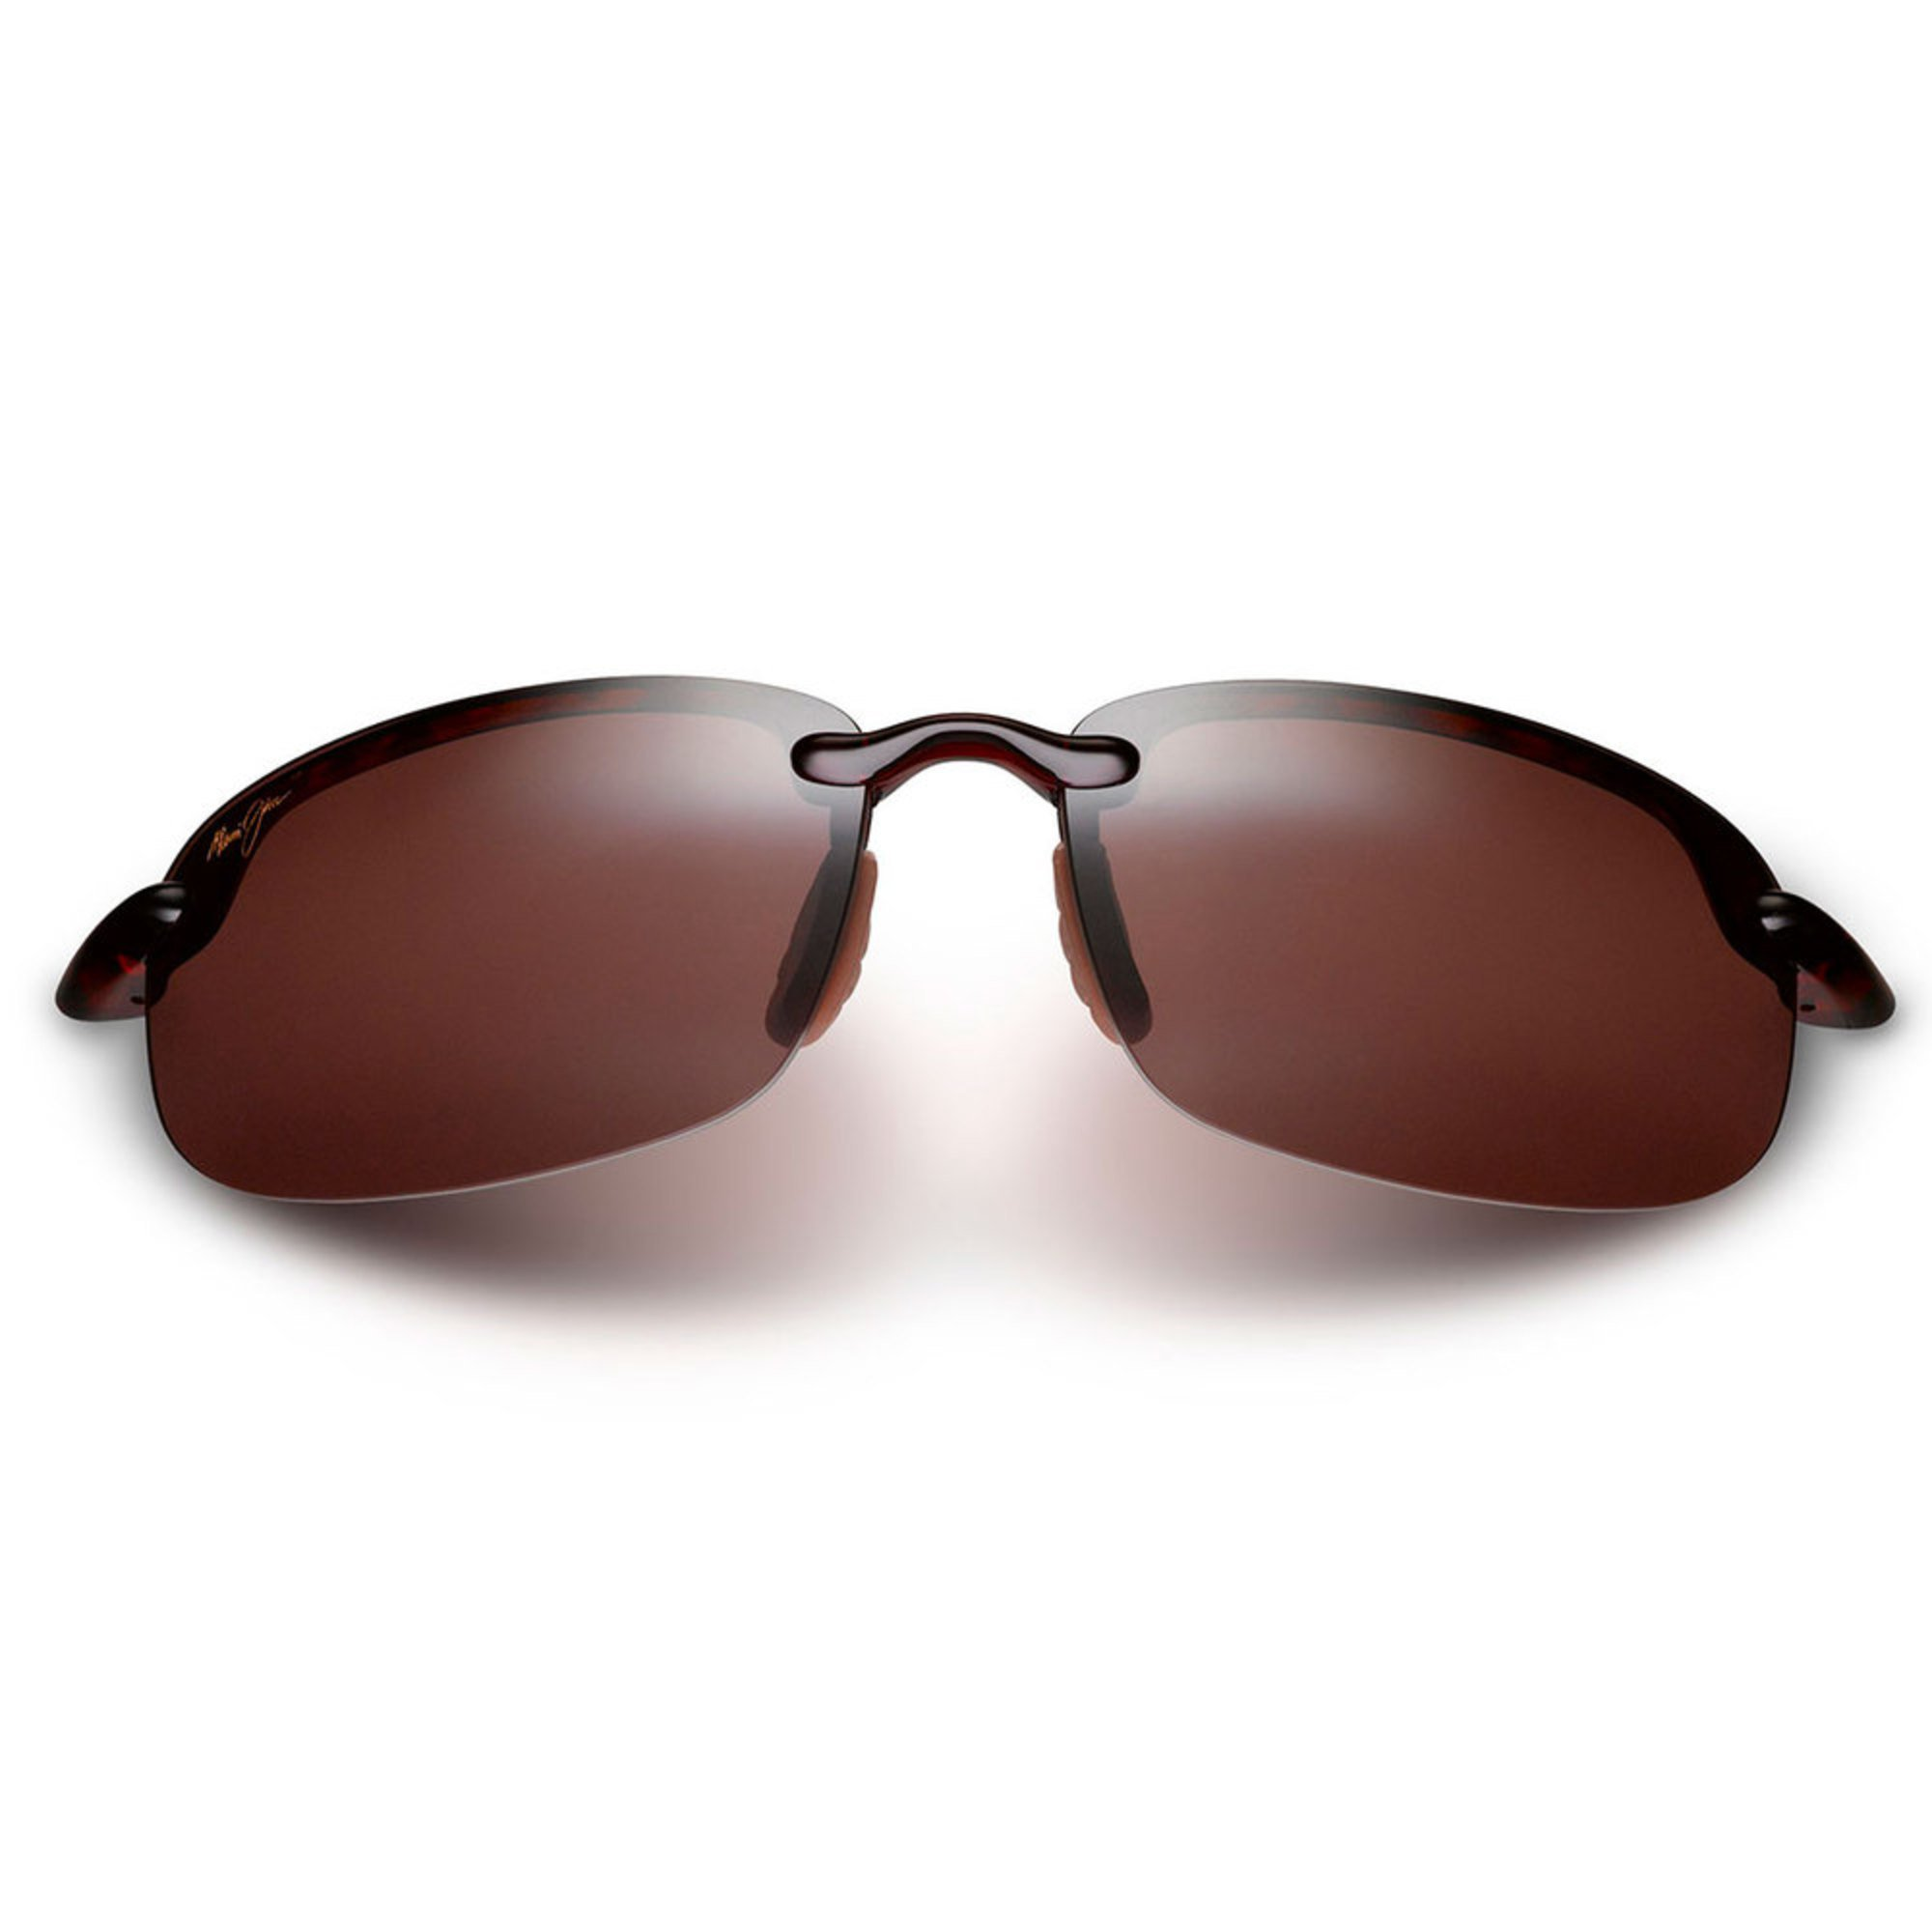 29412165594 Maui Jim. Maui Jim Unisex Polarized Ho okipa Maui Rose Sunglasses